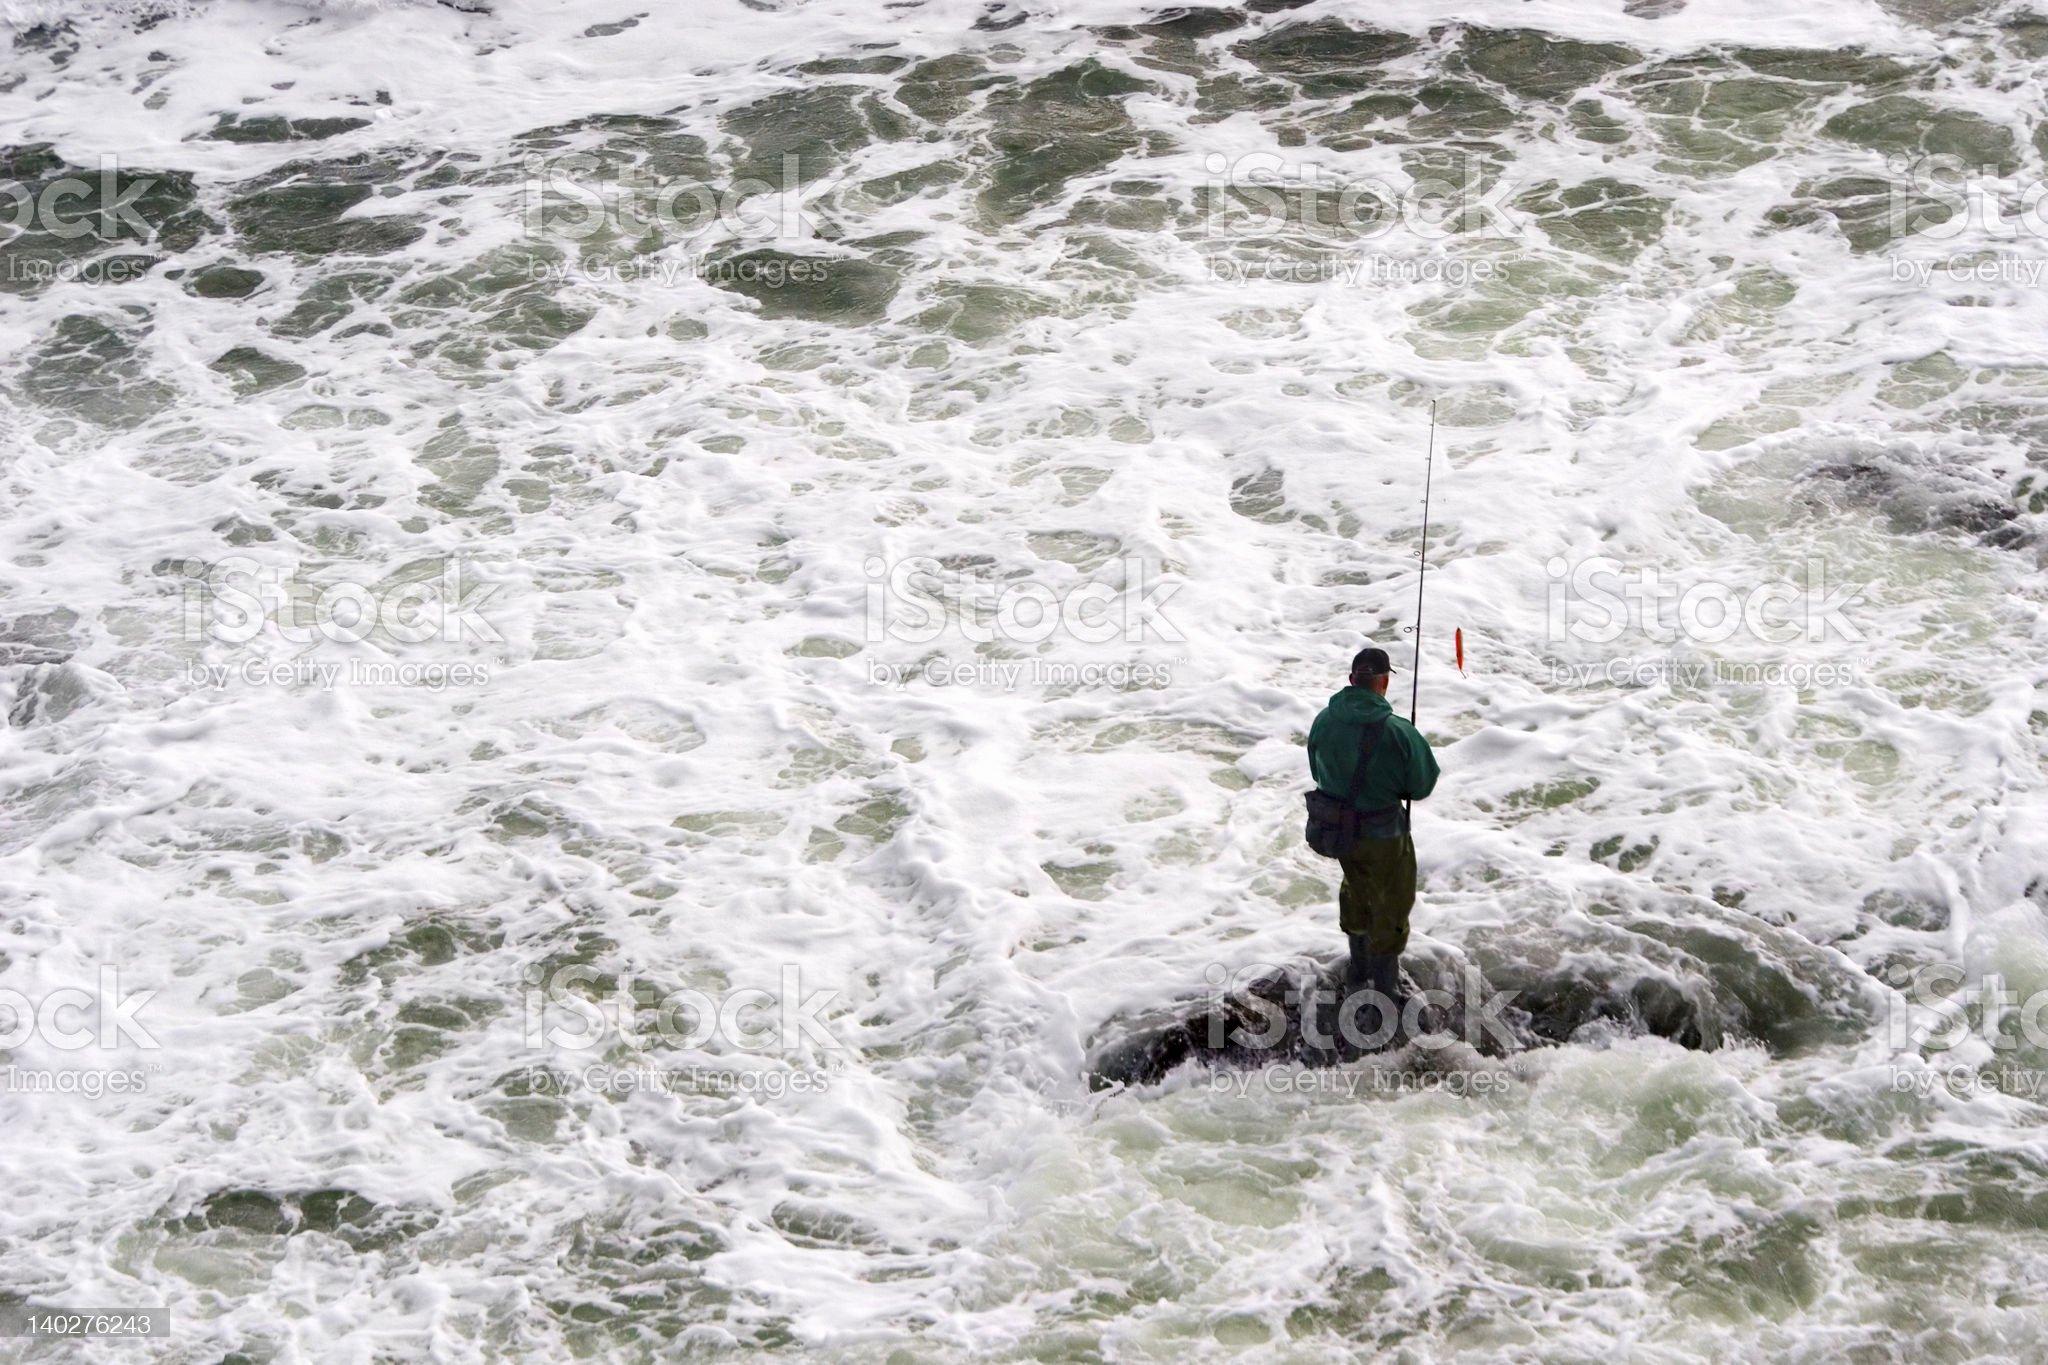 Fishing in the Turbulence royalty-free stock photo